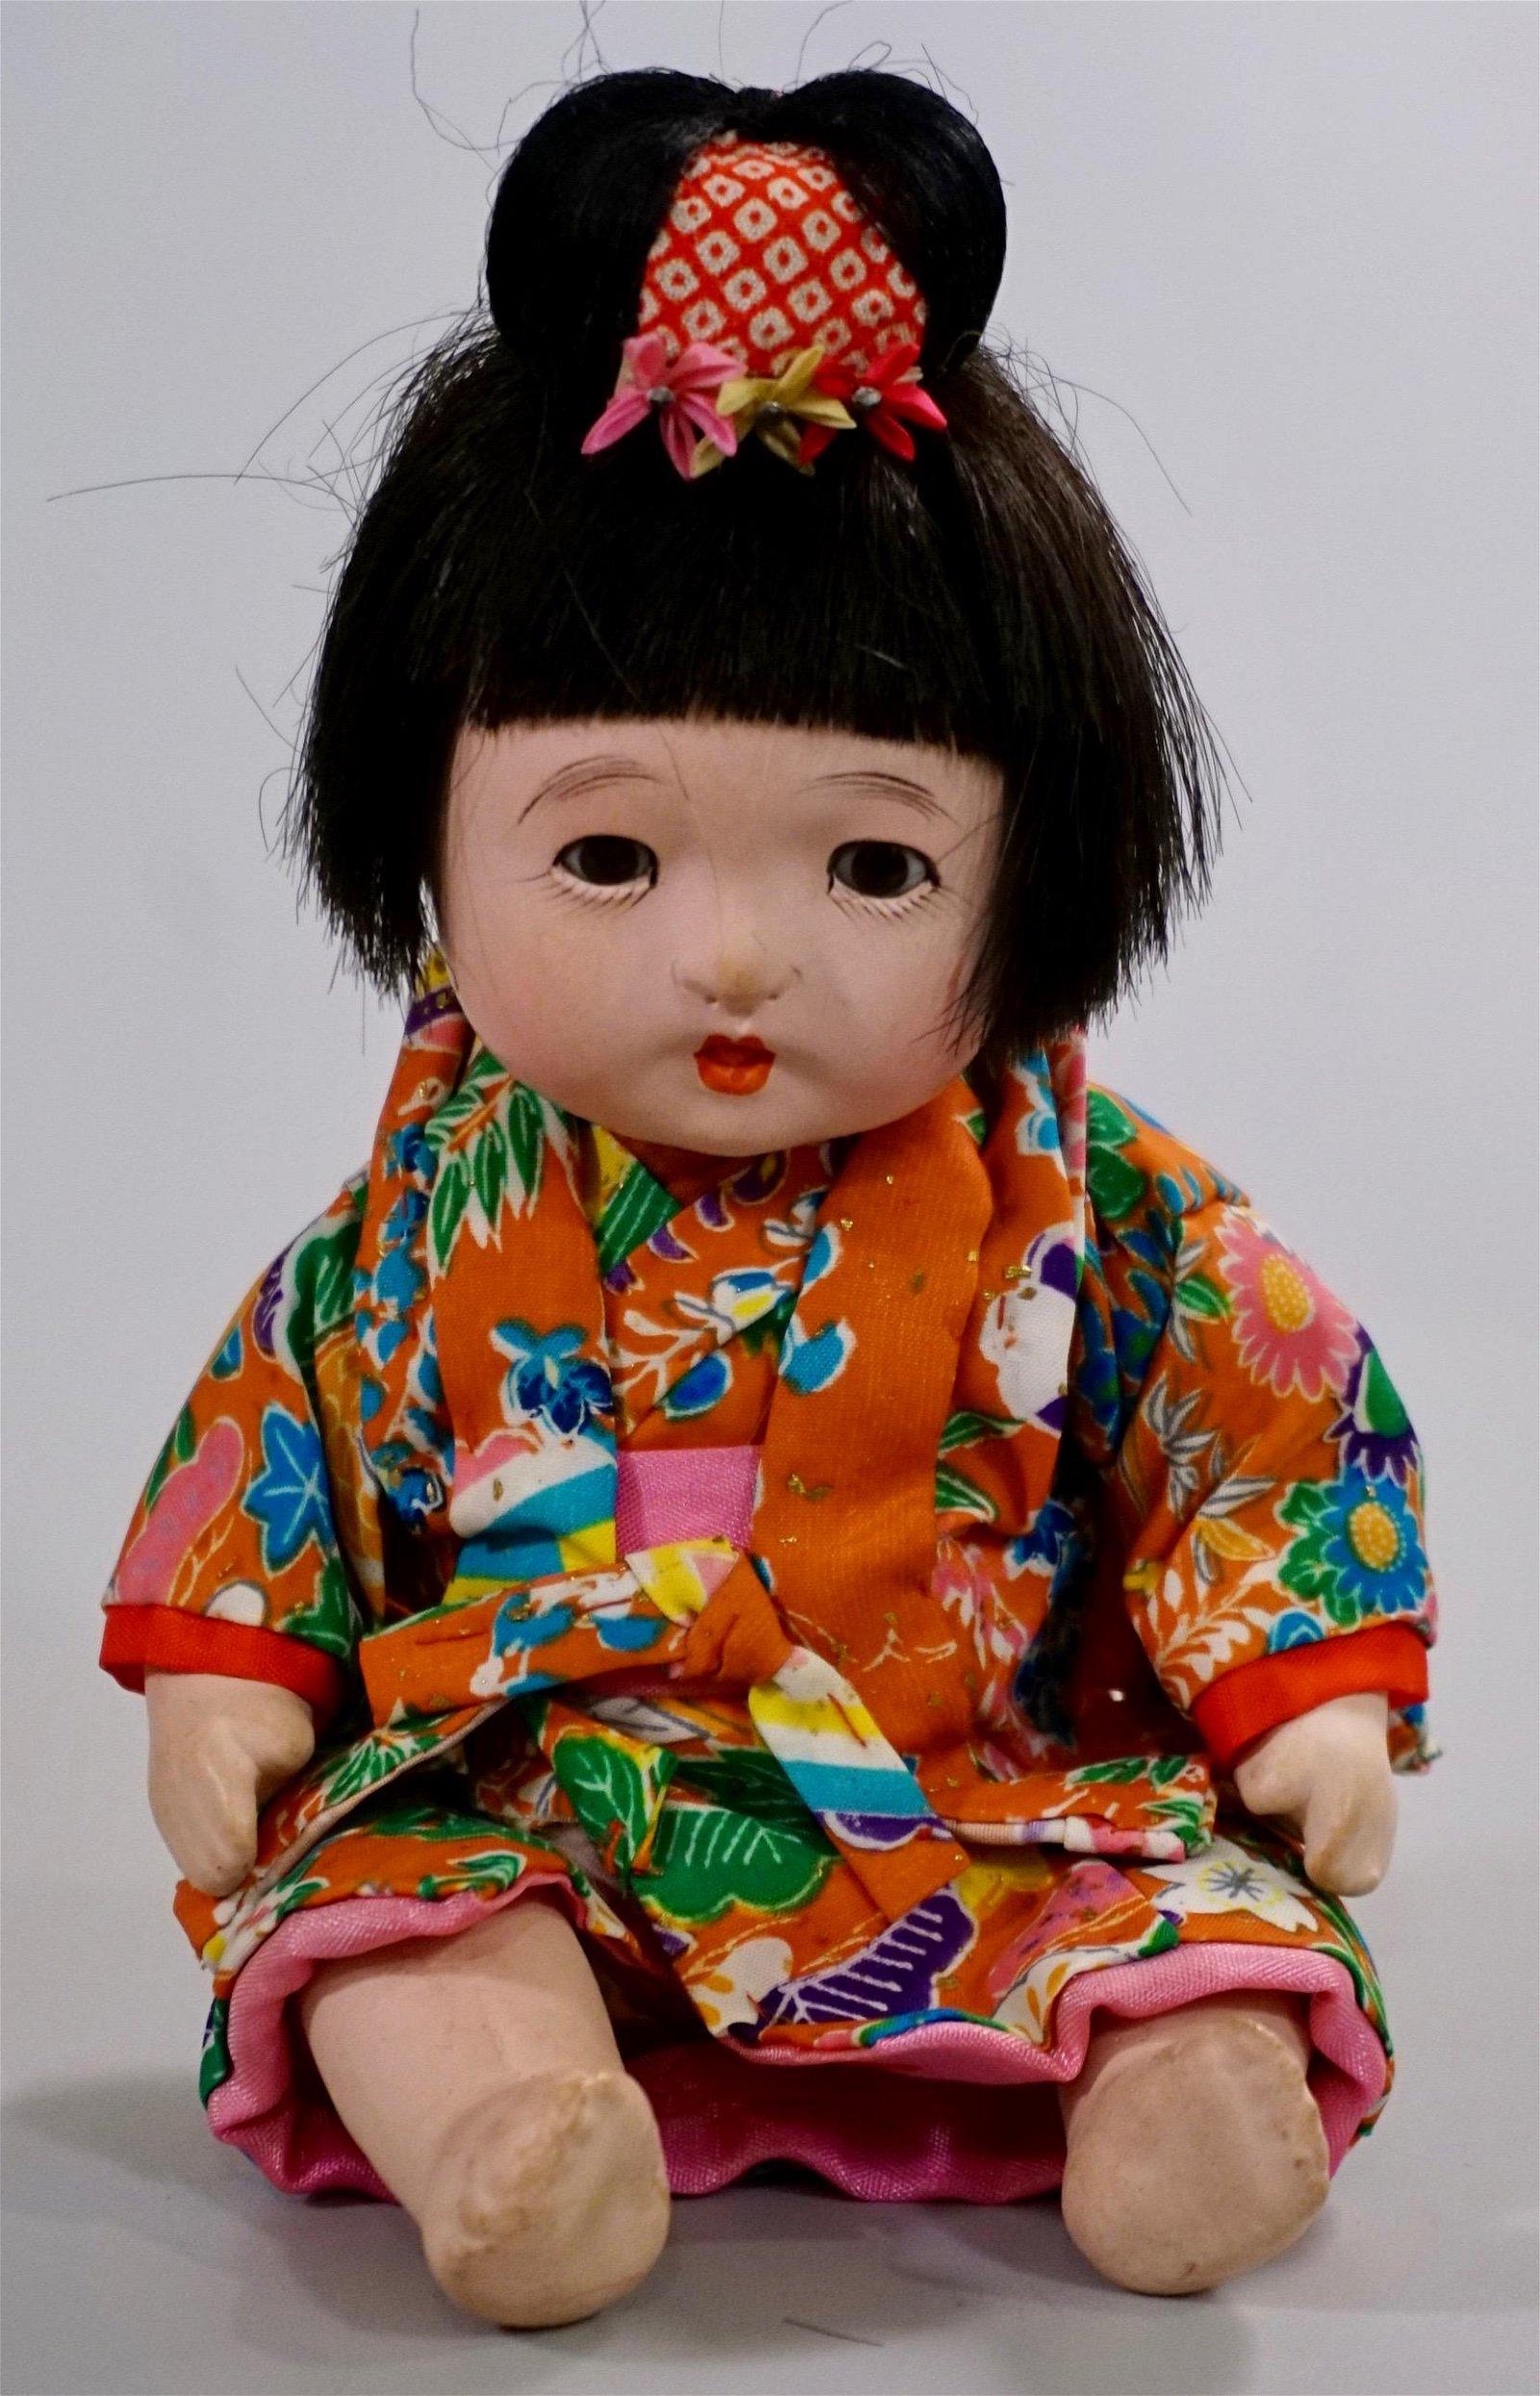 Japanese Porcelain Doll Glass Eye Jointed Ichimatsu